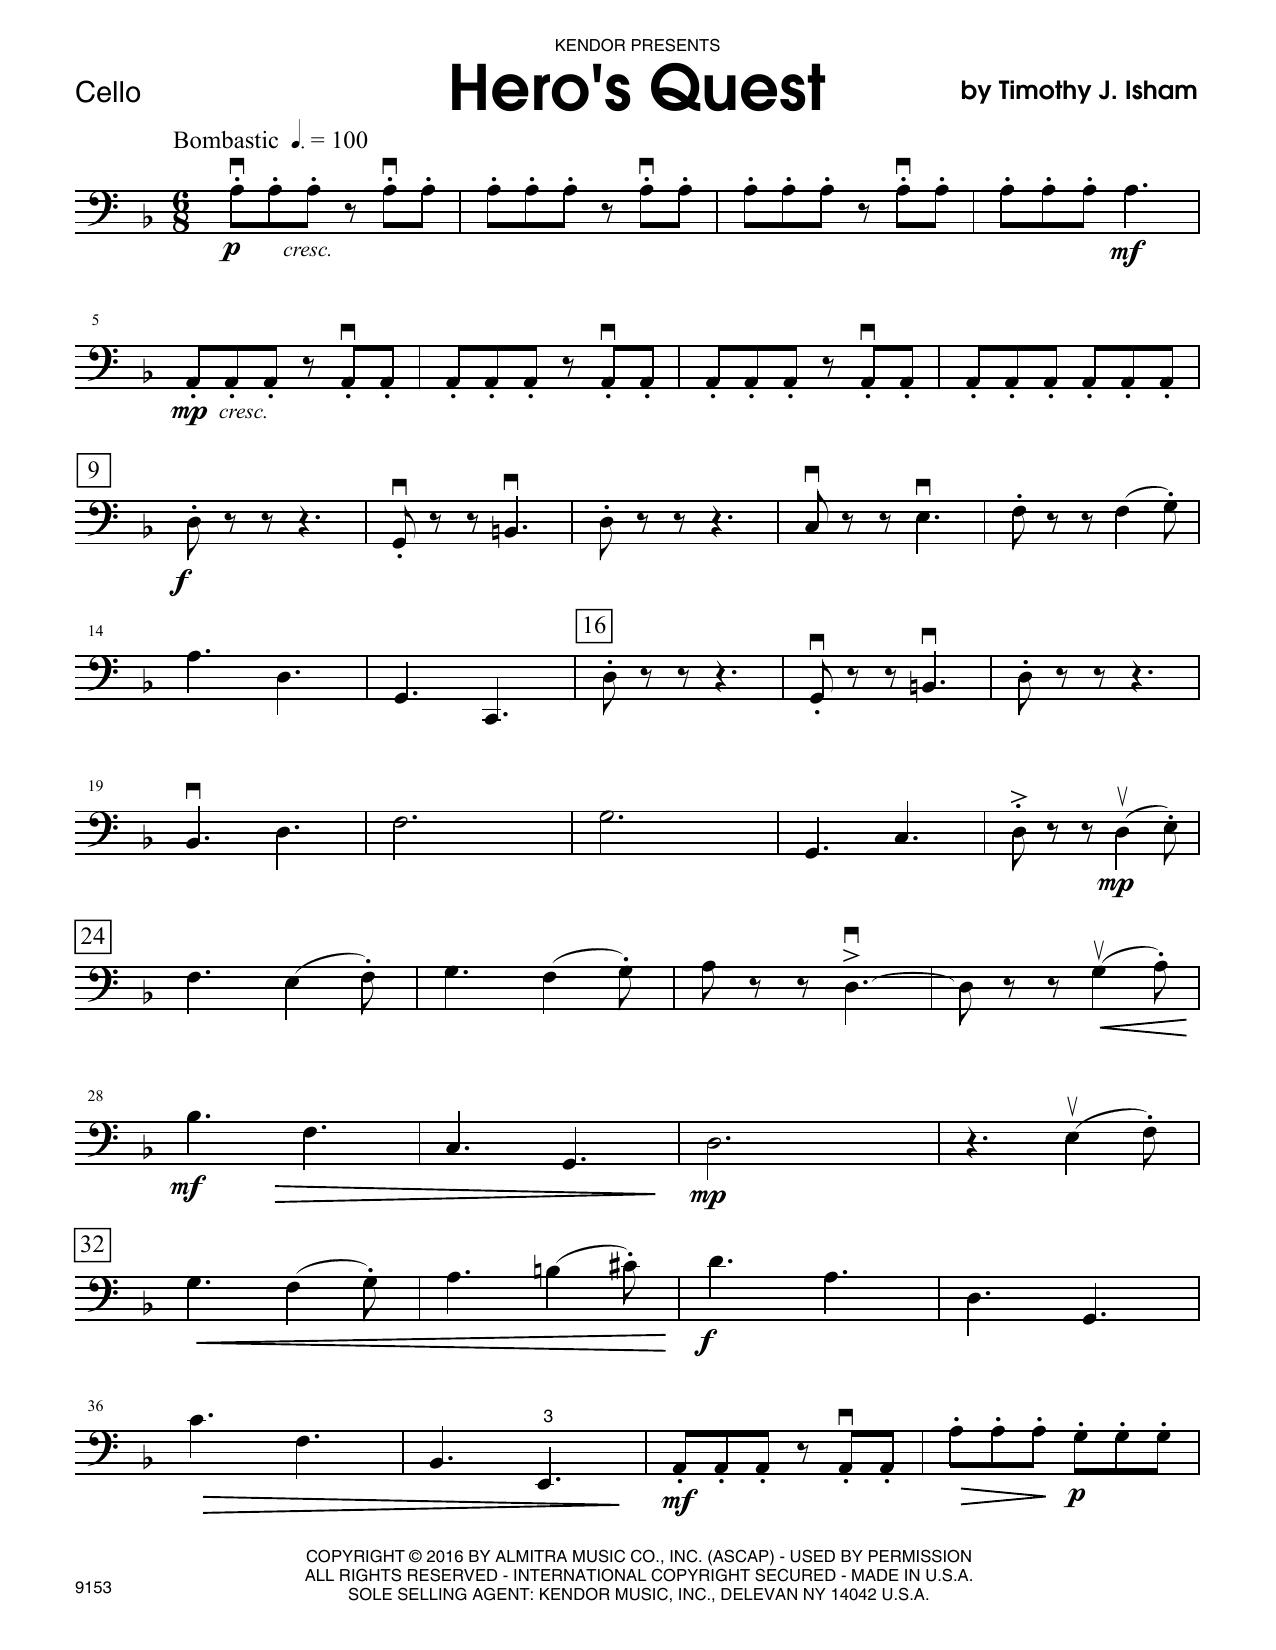 Hero's Quest - Cello Sheet Music